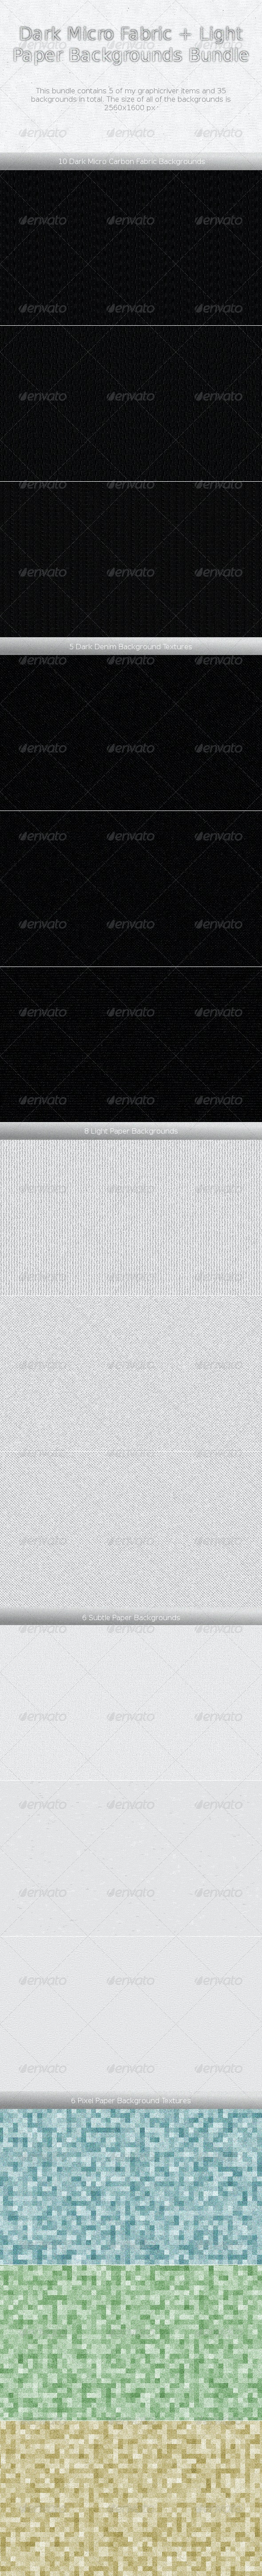 Dark Micro Fabric + Light Paper Backgrounds Bundle - Miscellaneous Backgrounds